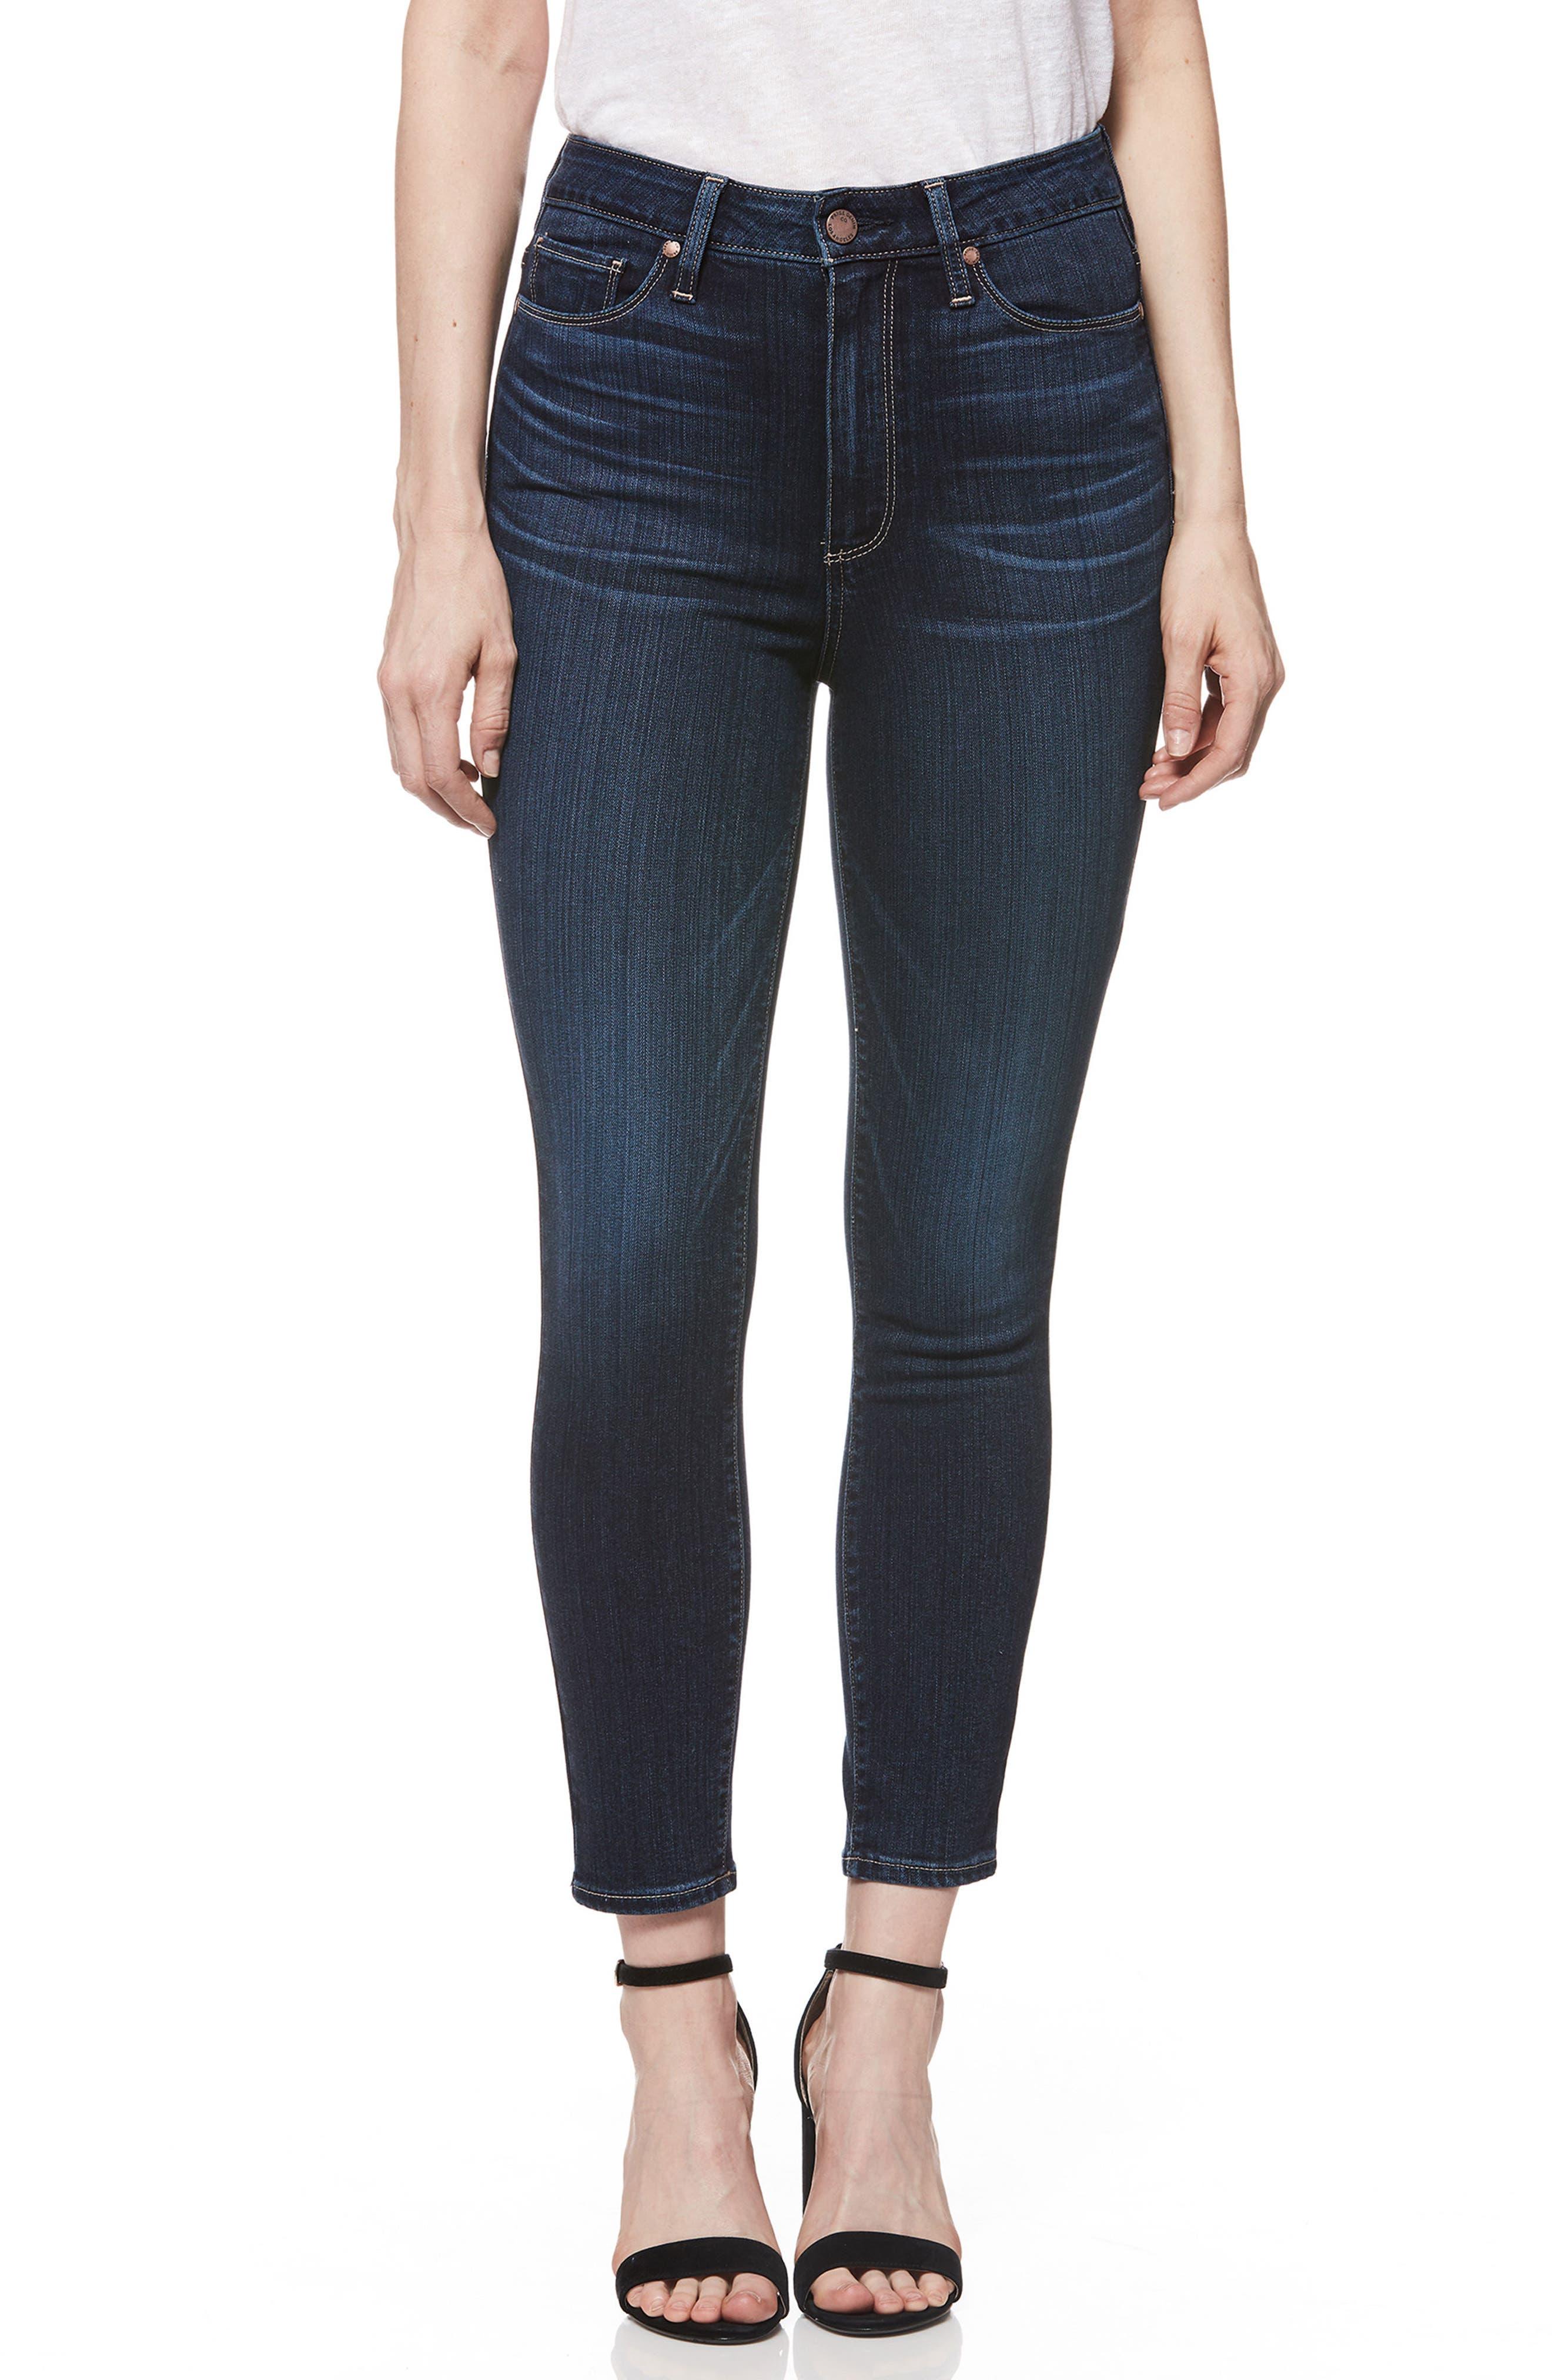 Transcend - Margot High Waist Crop Skinny Jeans,                         Main,                         color, Sawtelle